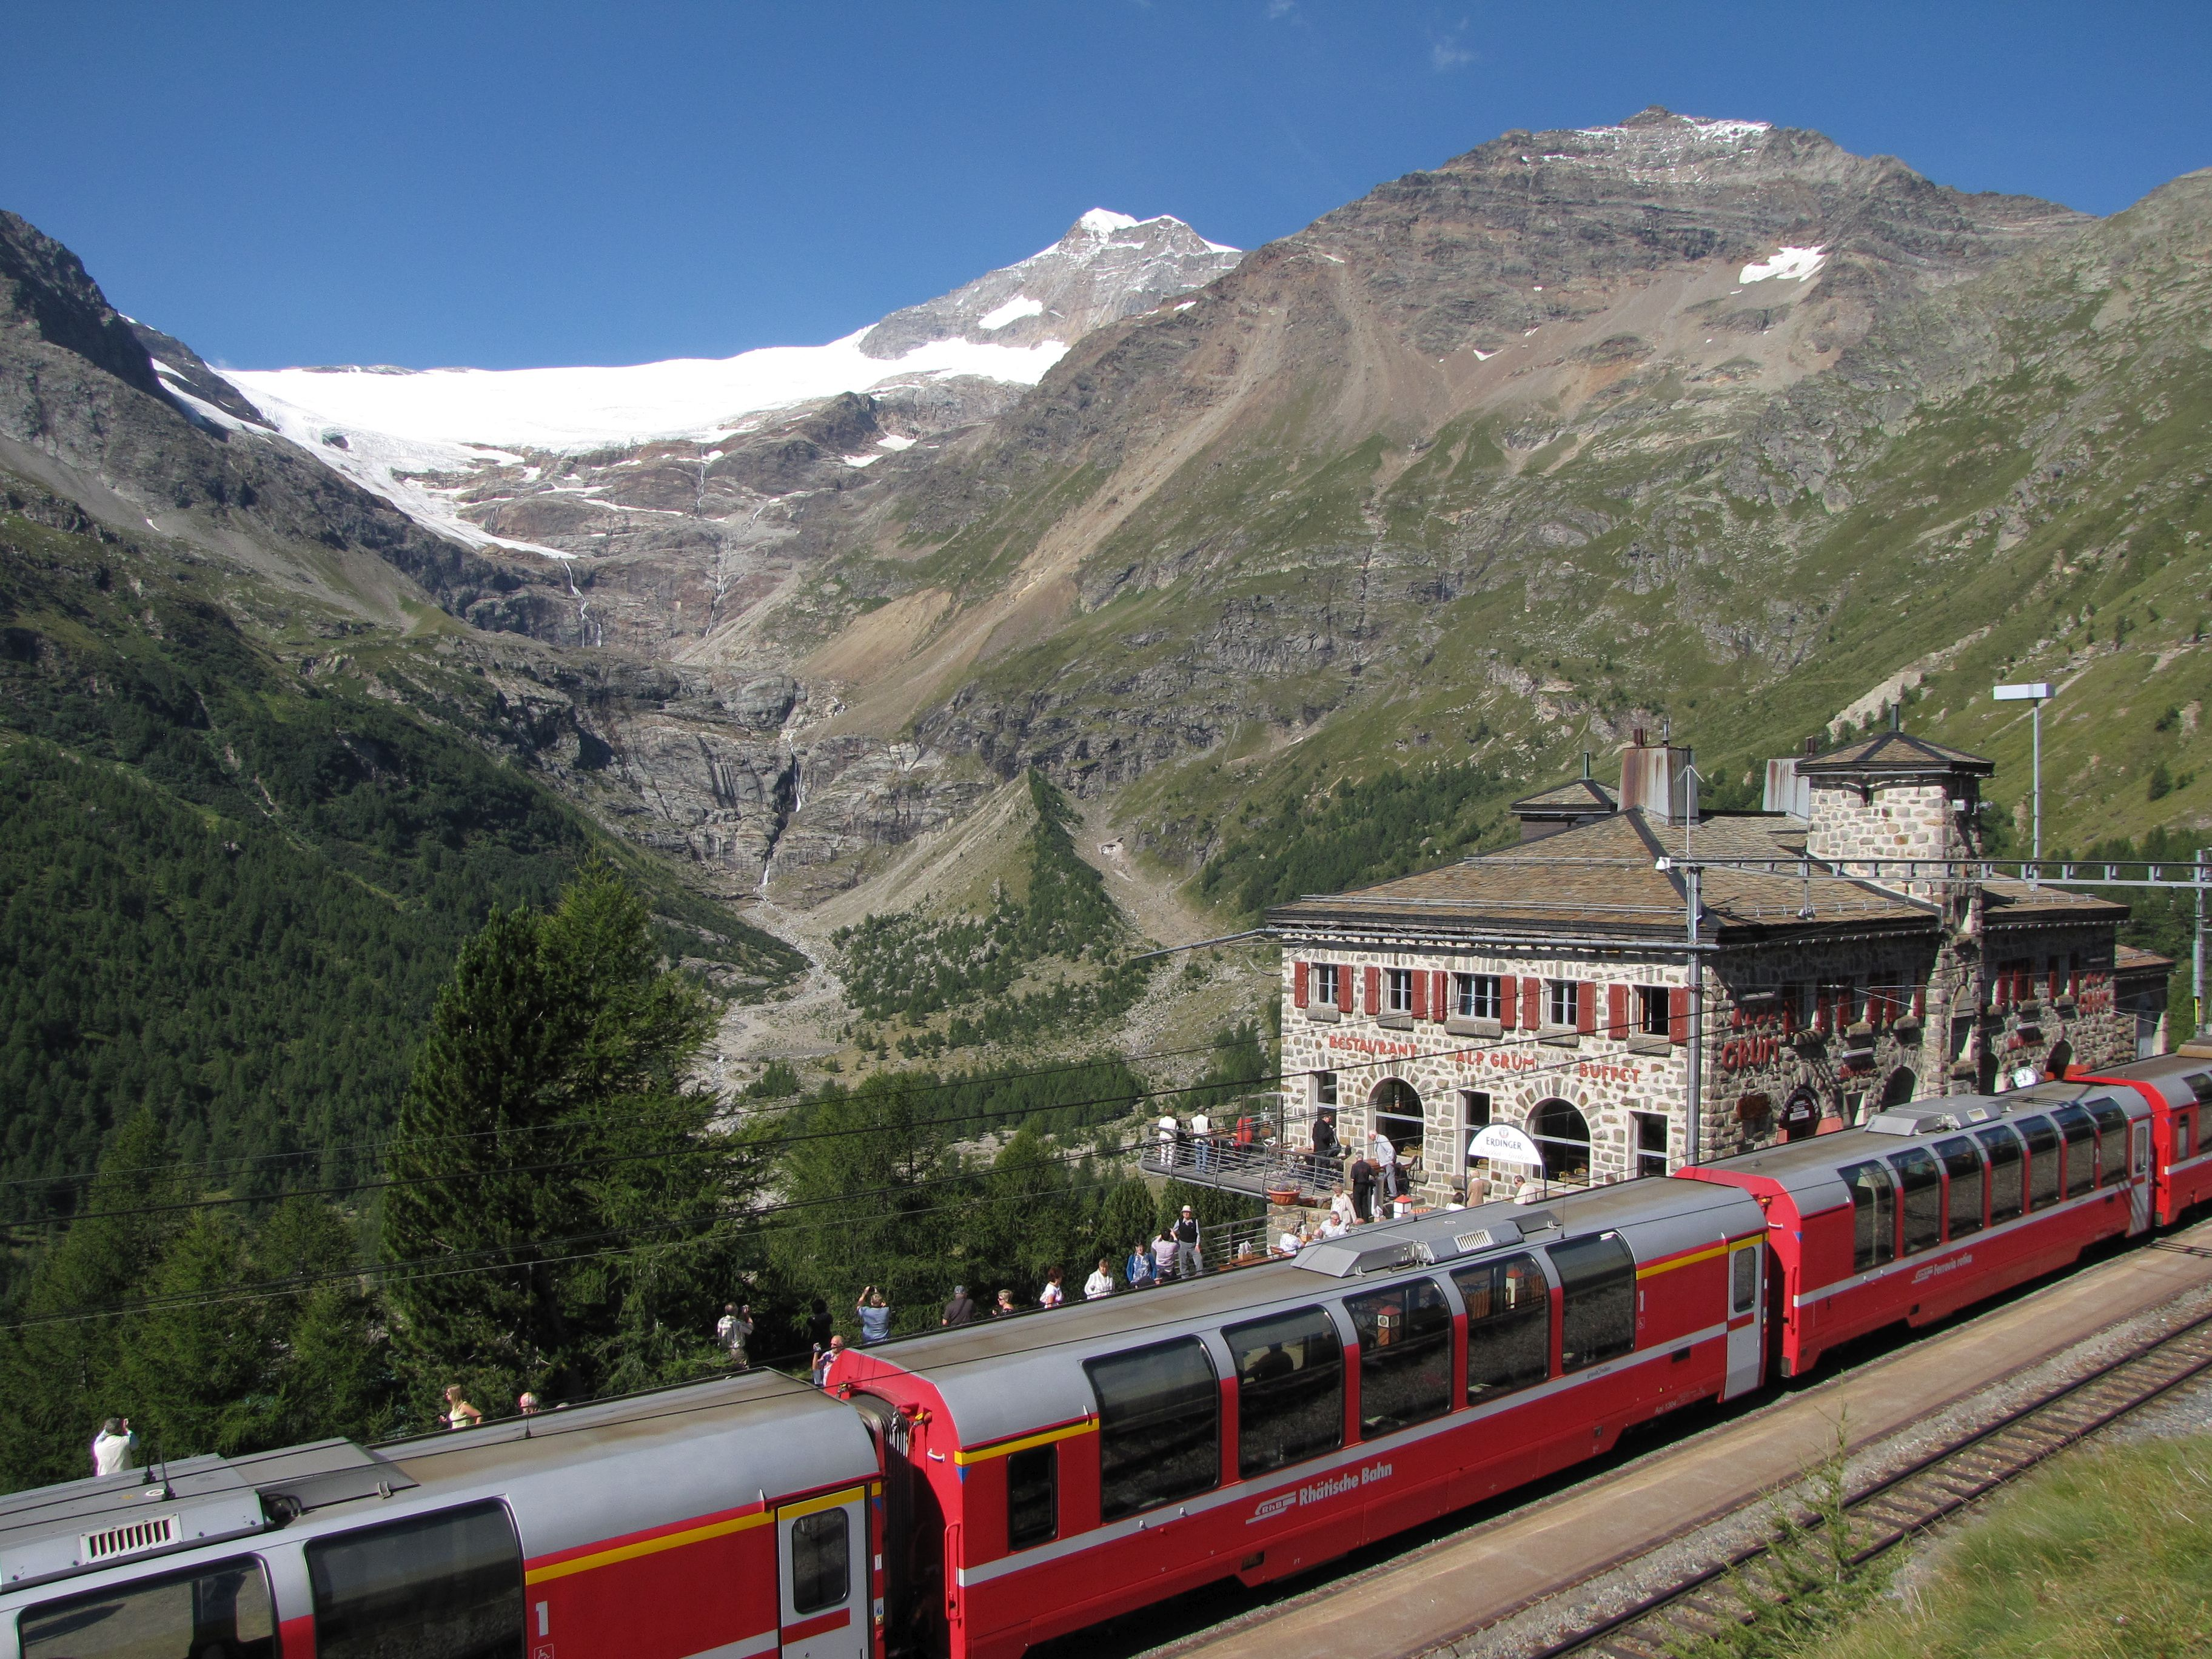 Albergo Ristorante Alp Grüm Slide 4